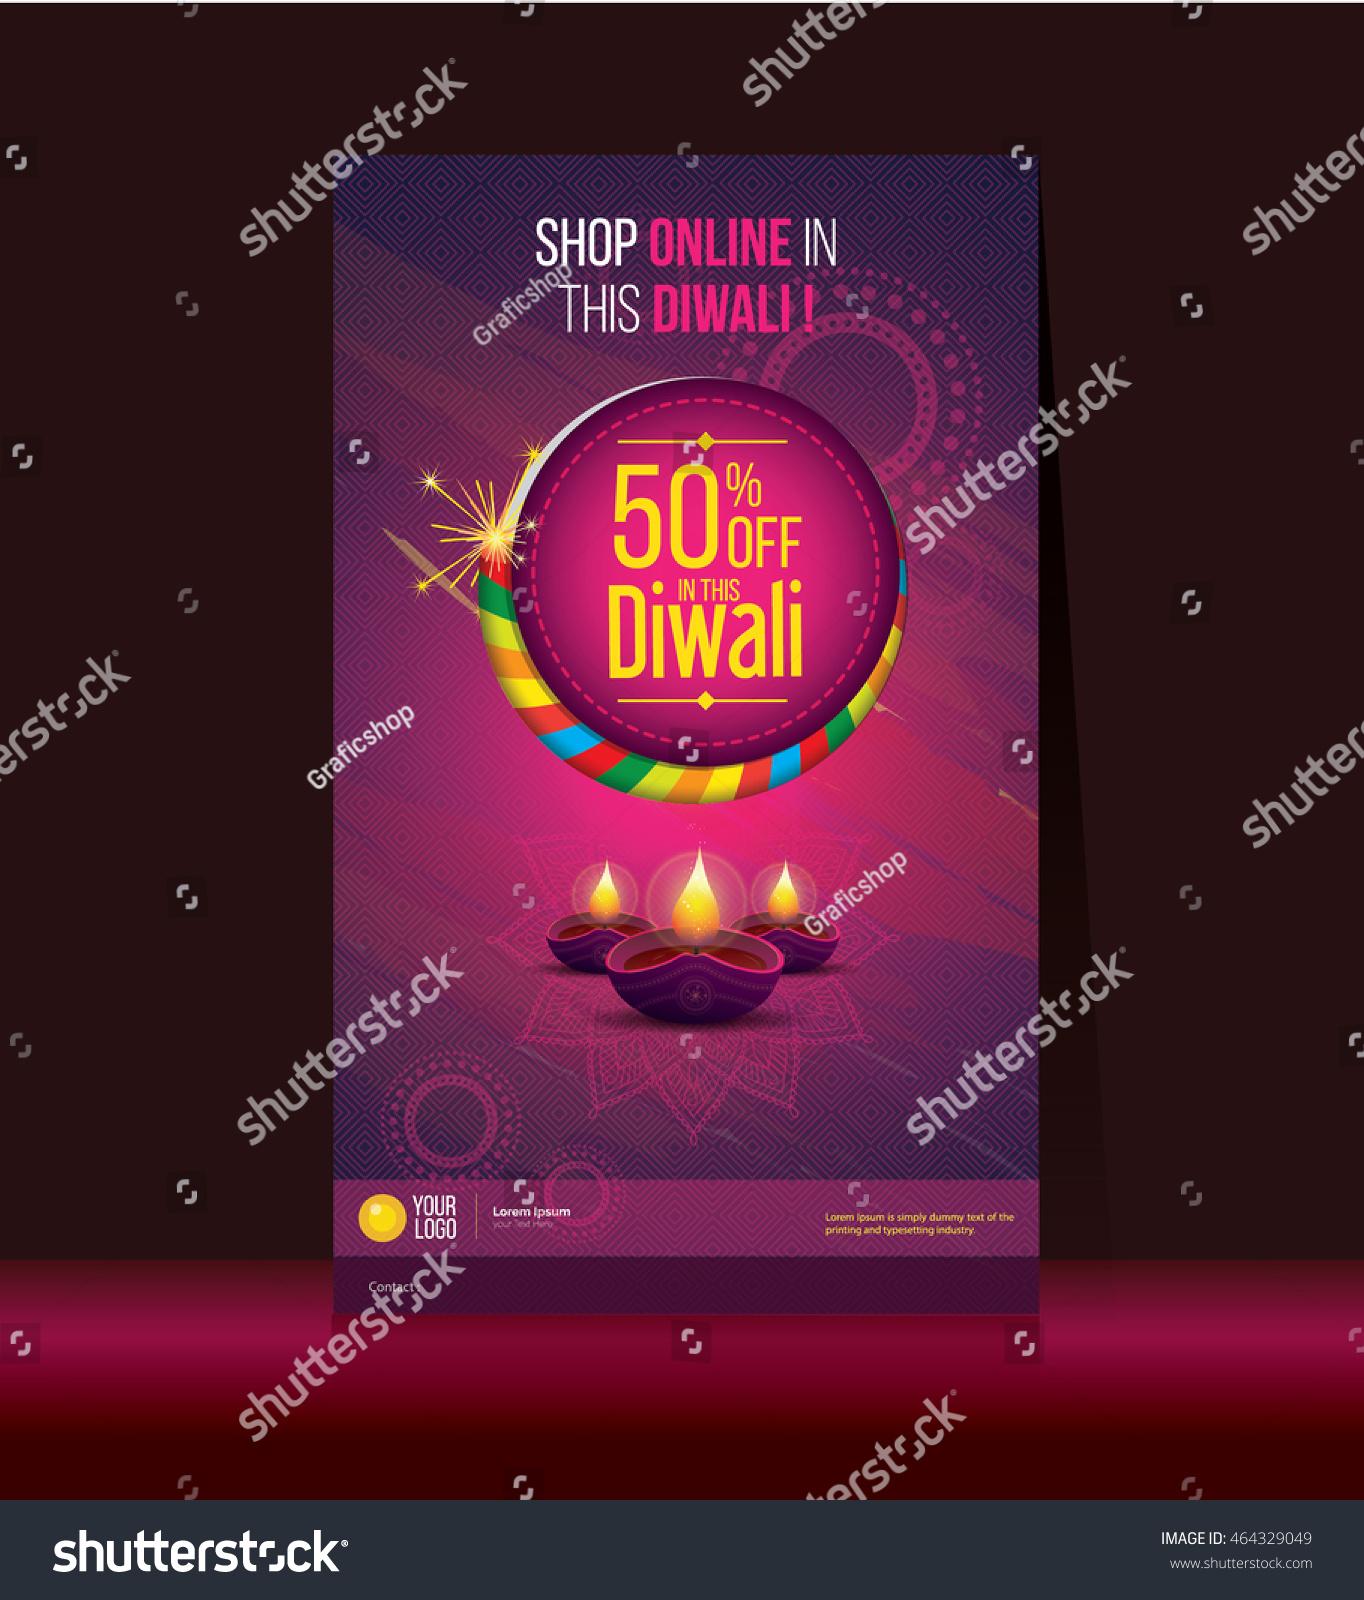 Diwali Festival Offer Poster Design Template Stock Vector (Royalty ...